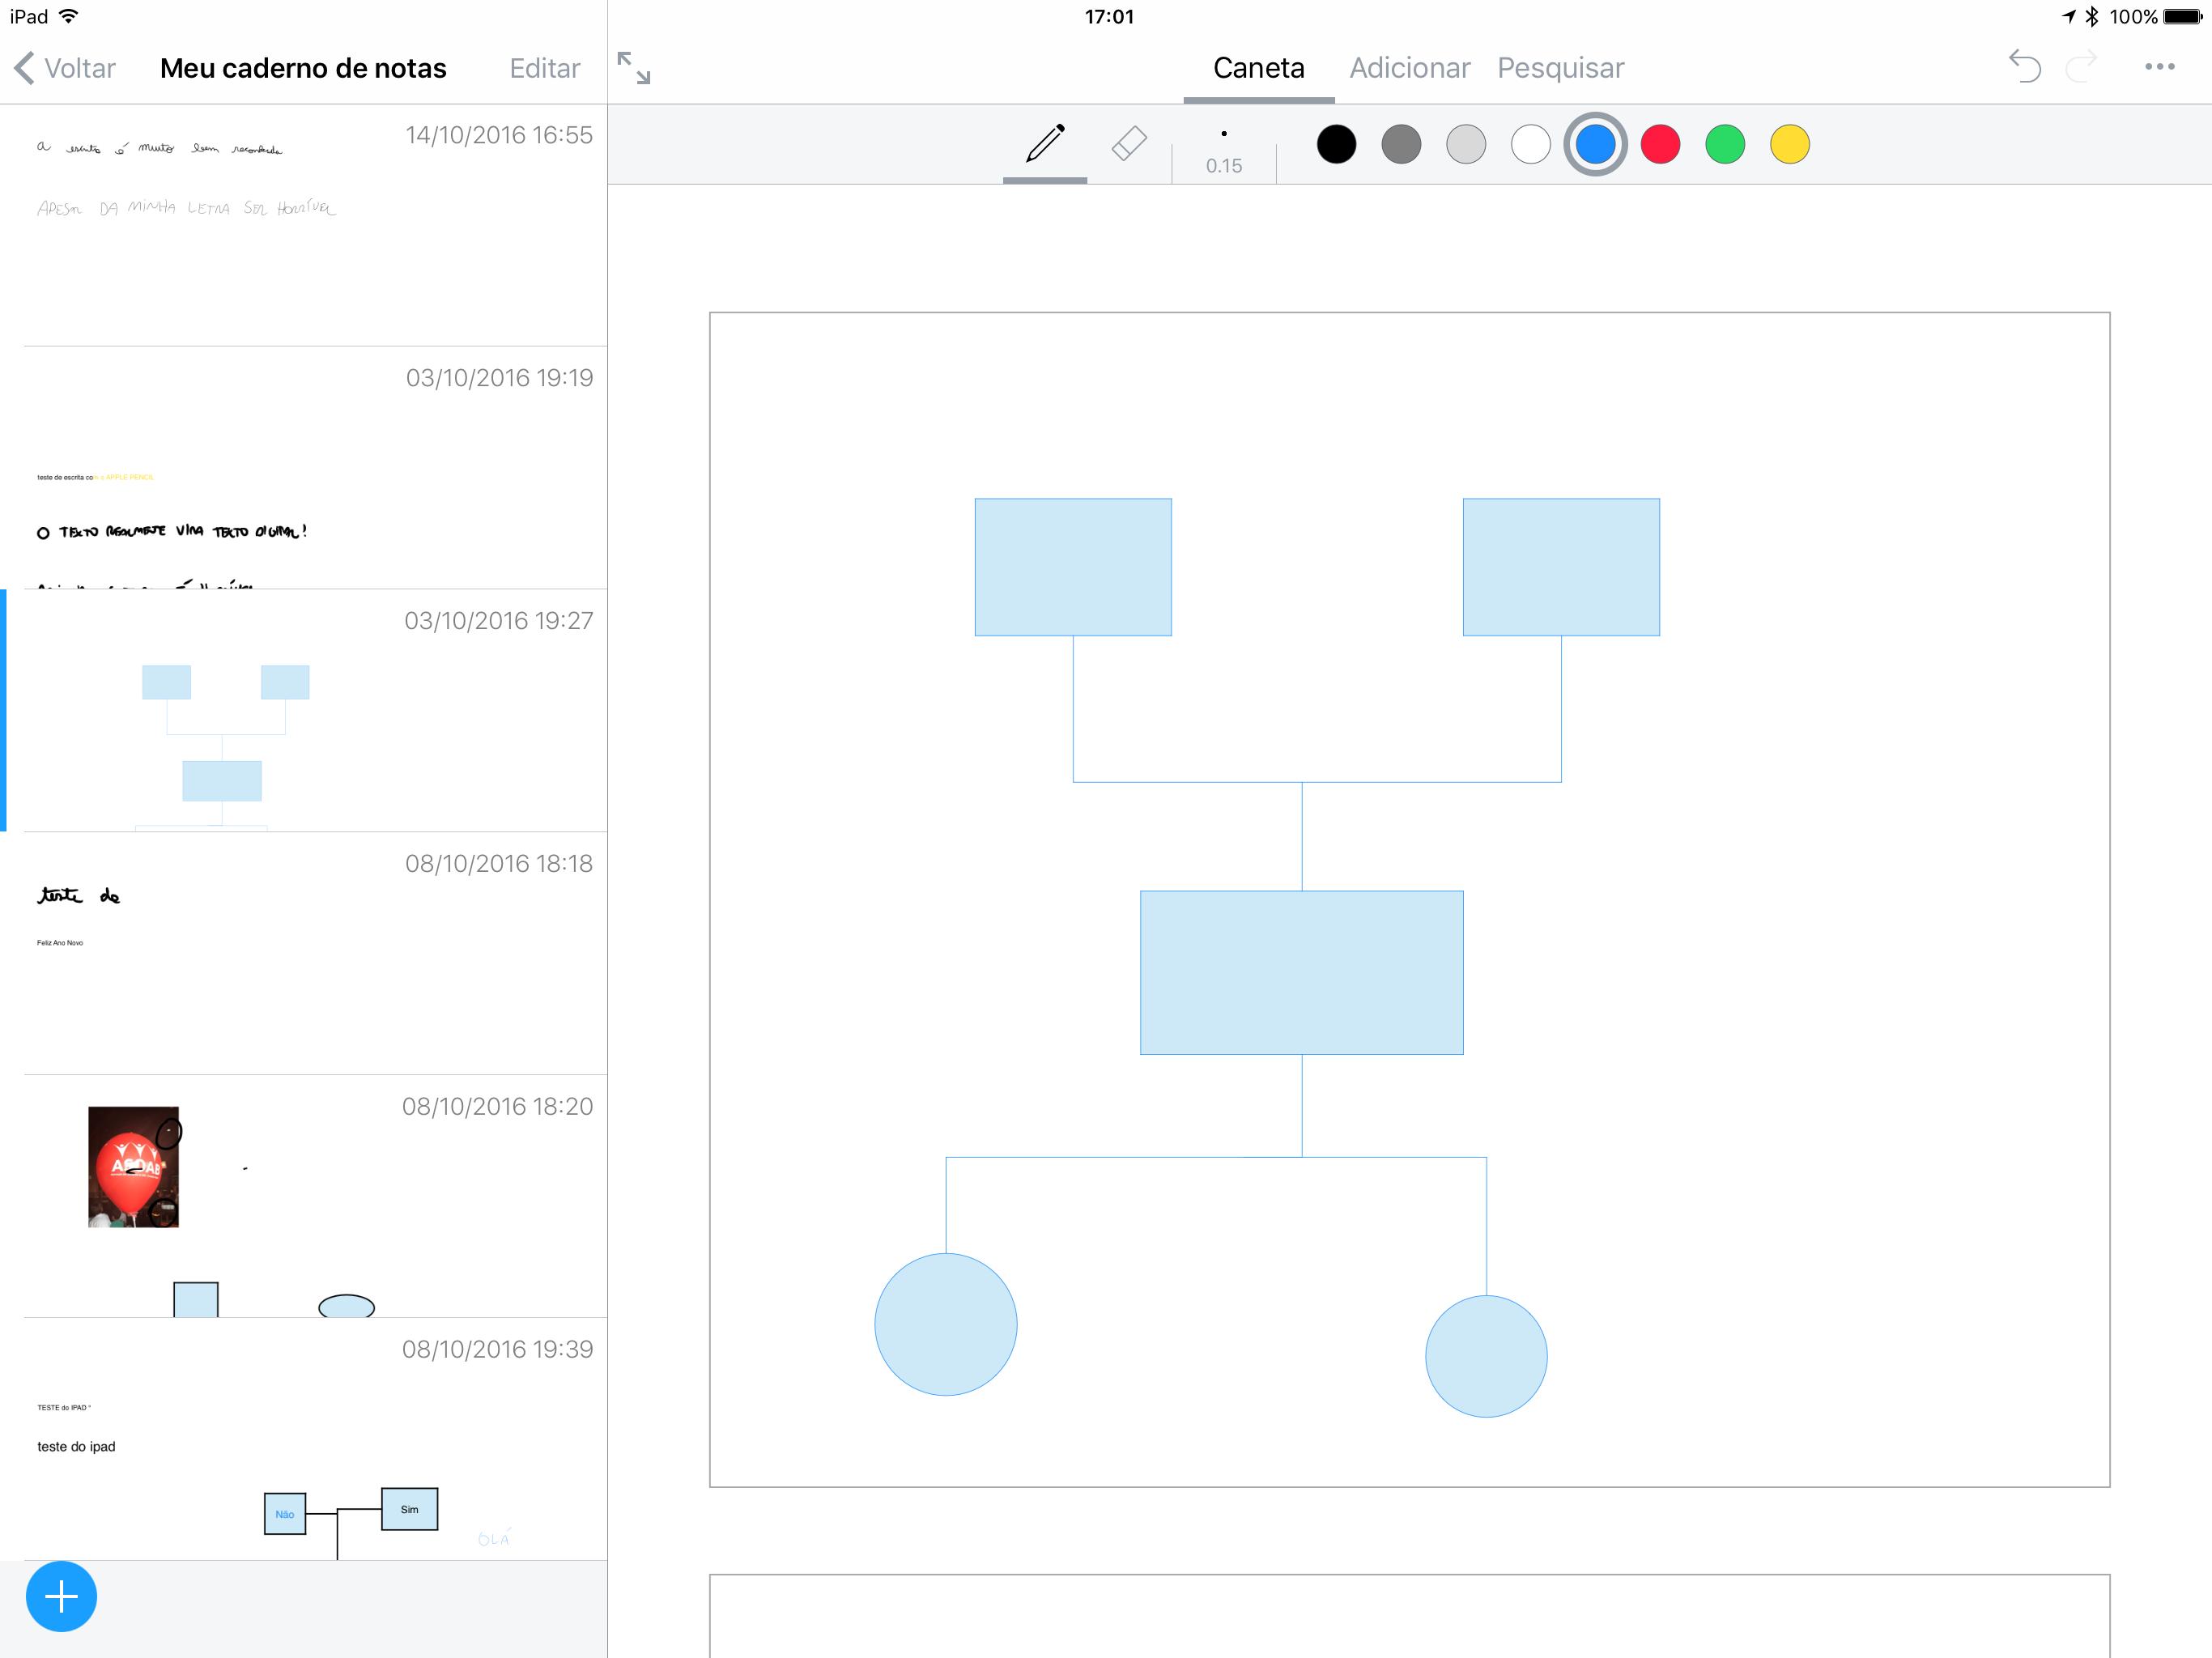 Diagramas no app Nebo para iOS (iPads)